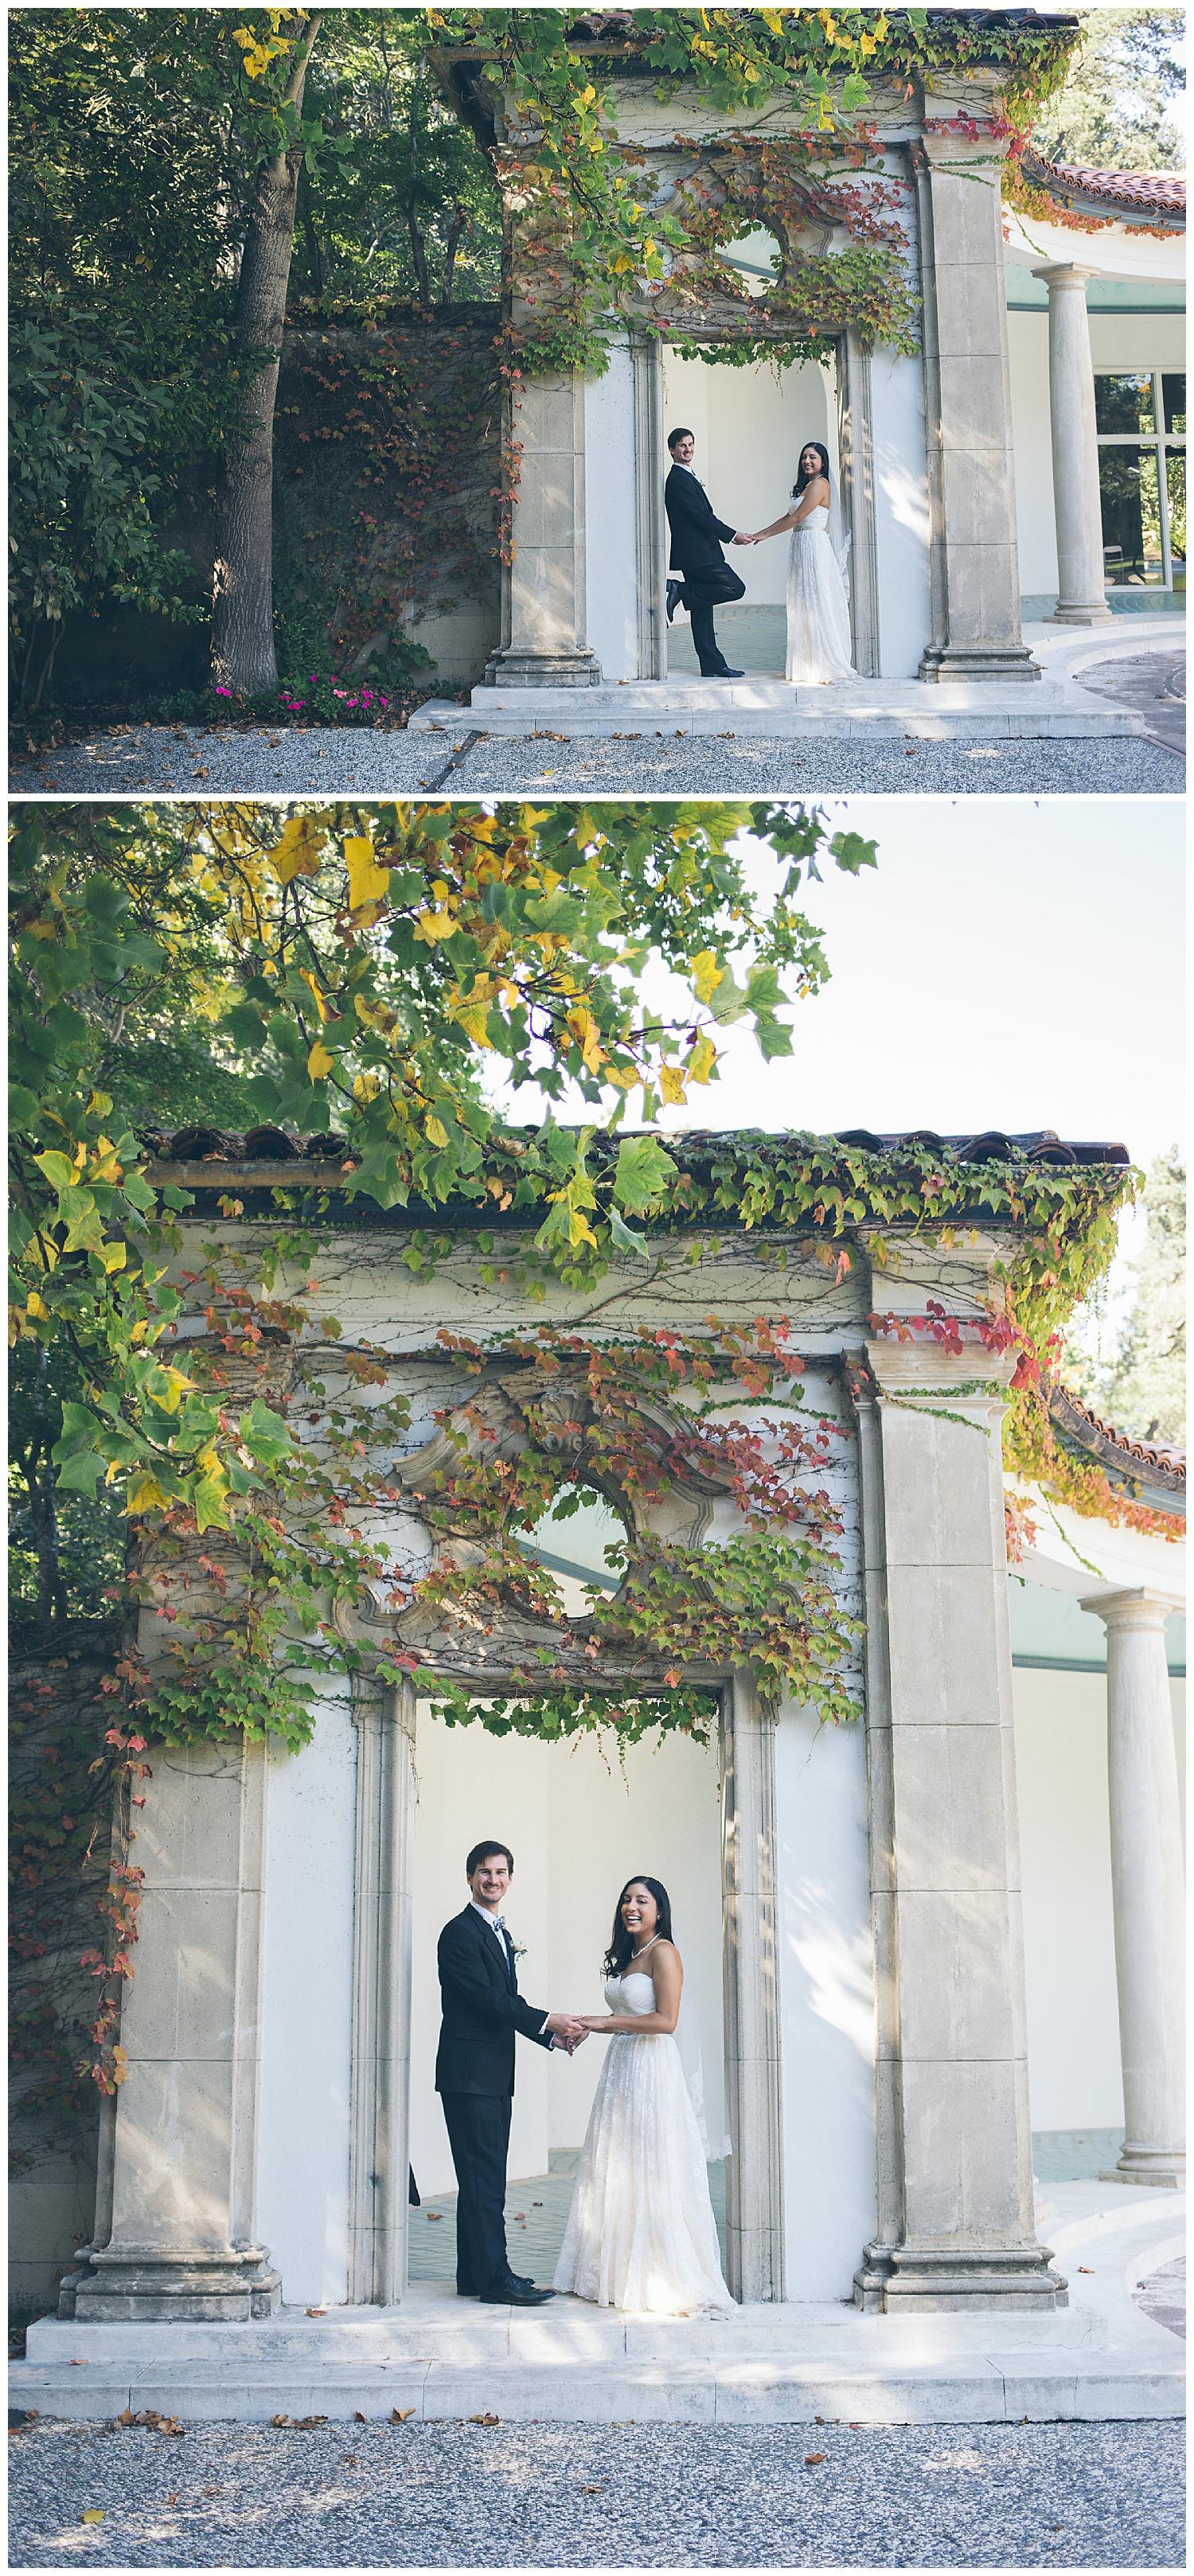 khariza-rae-photography-bay-area-wedding-photographer_0167.jpg